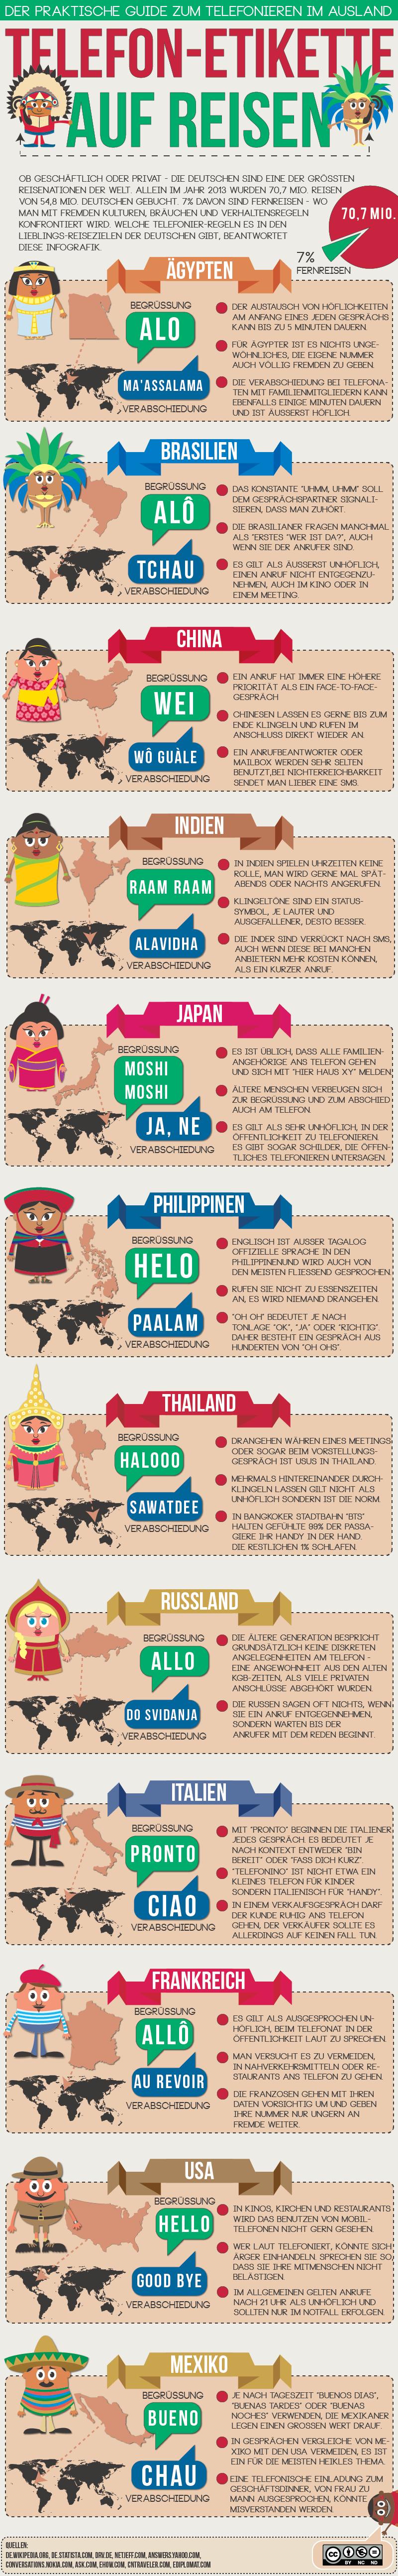 infografik-telefon-etikette